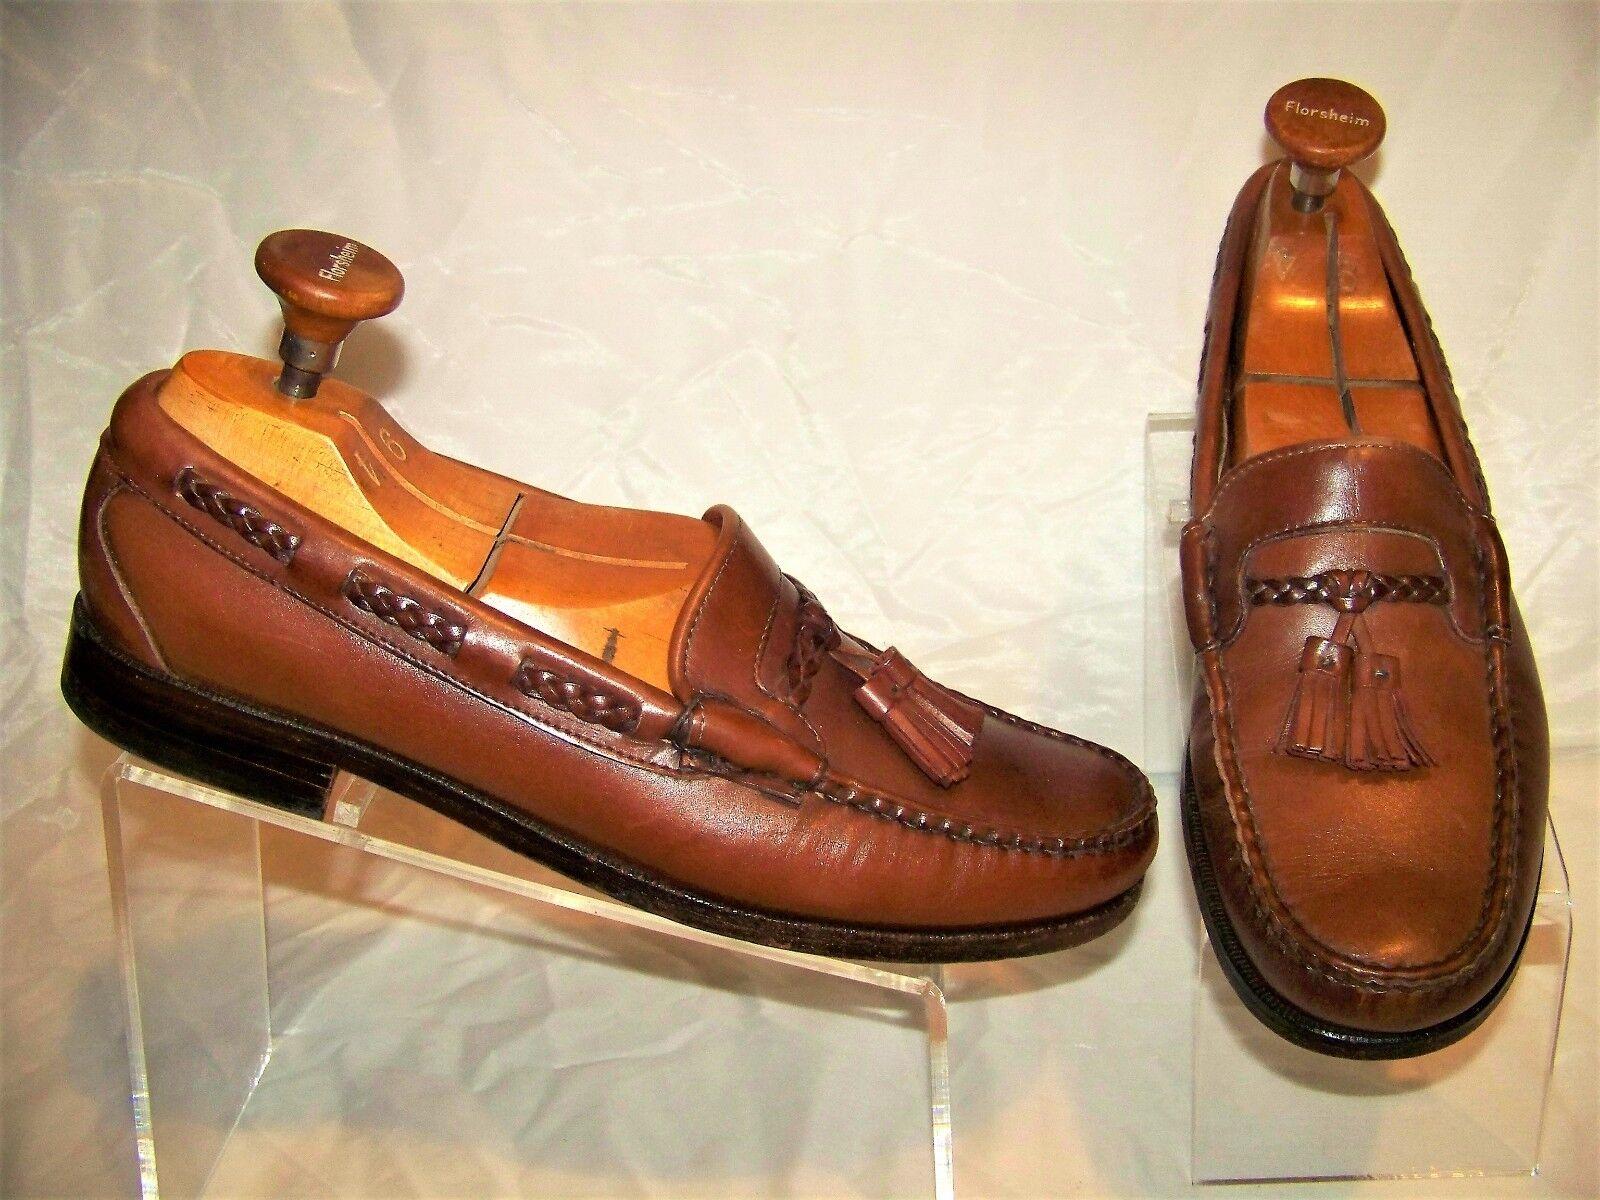 Allen Edmonds Carthage 42426 Brown Leather Moc Toe Tassels Men's Loafers US 11D